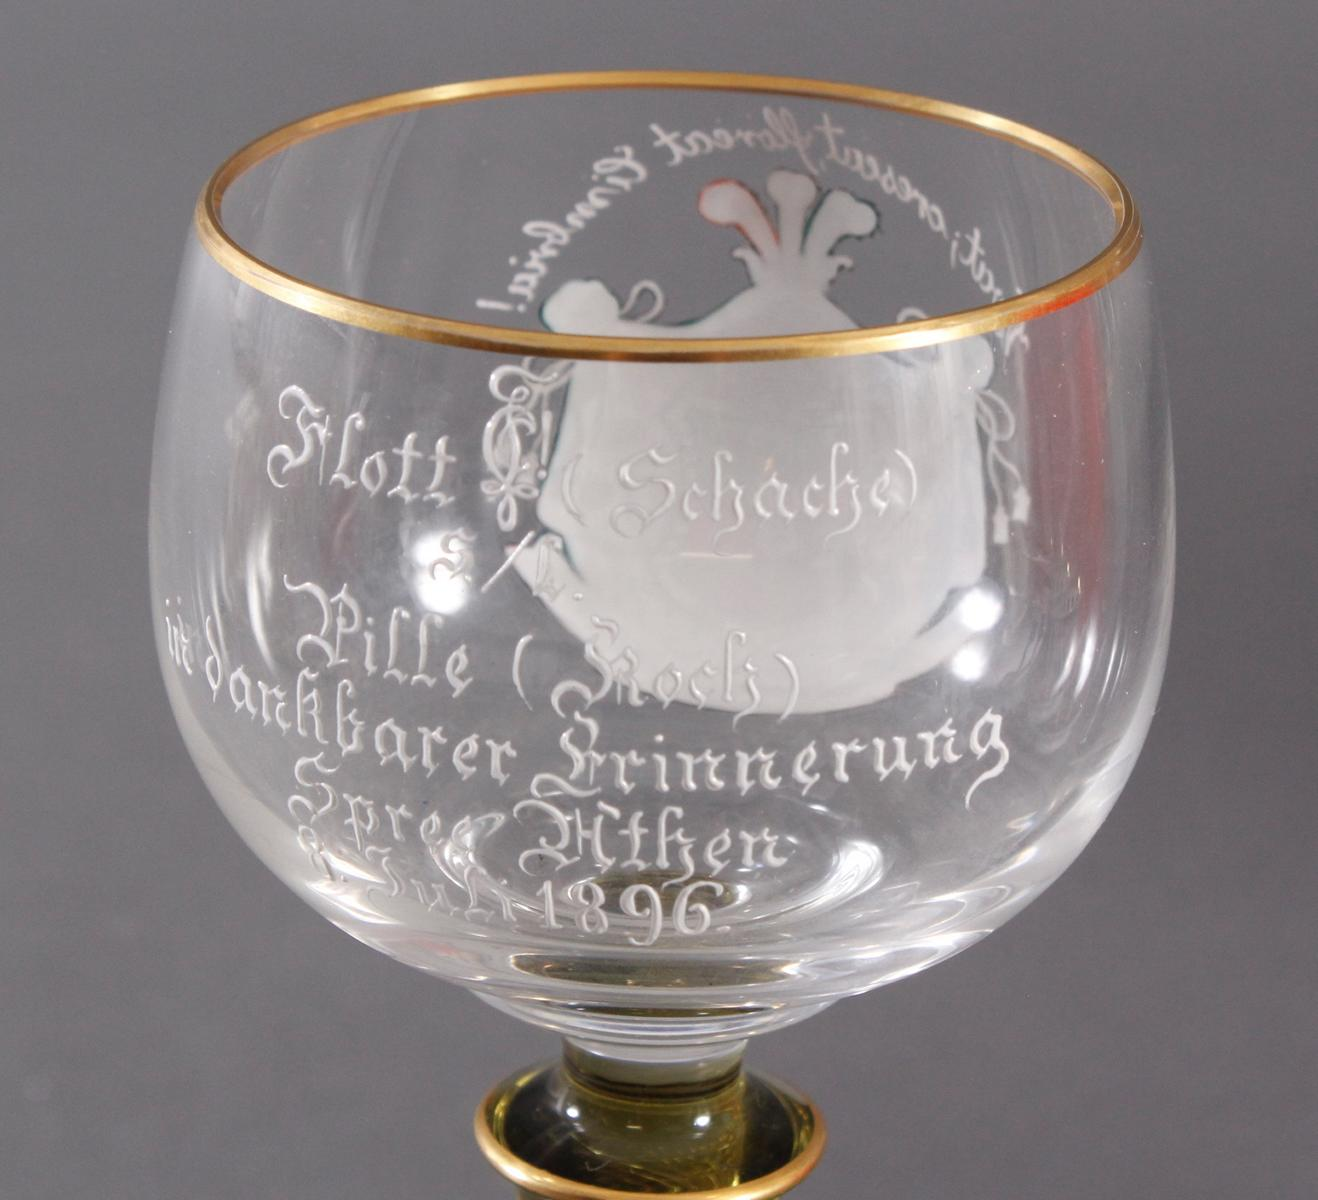 Andenkenglas, Verbindungsglas um 1900-5